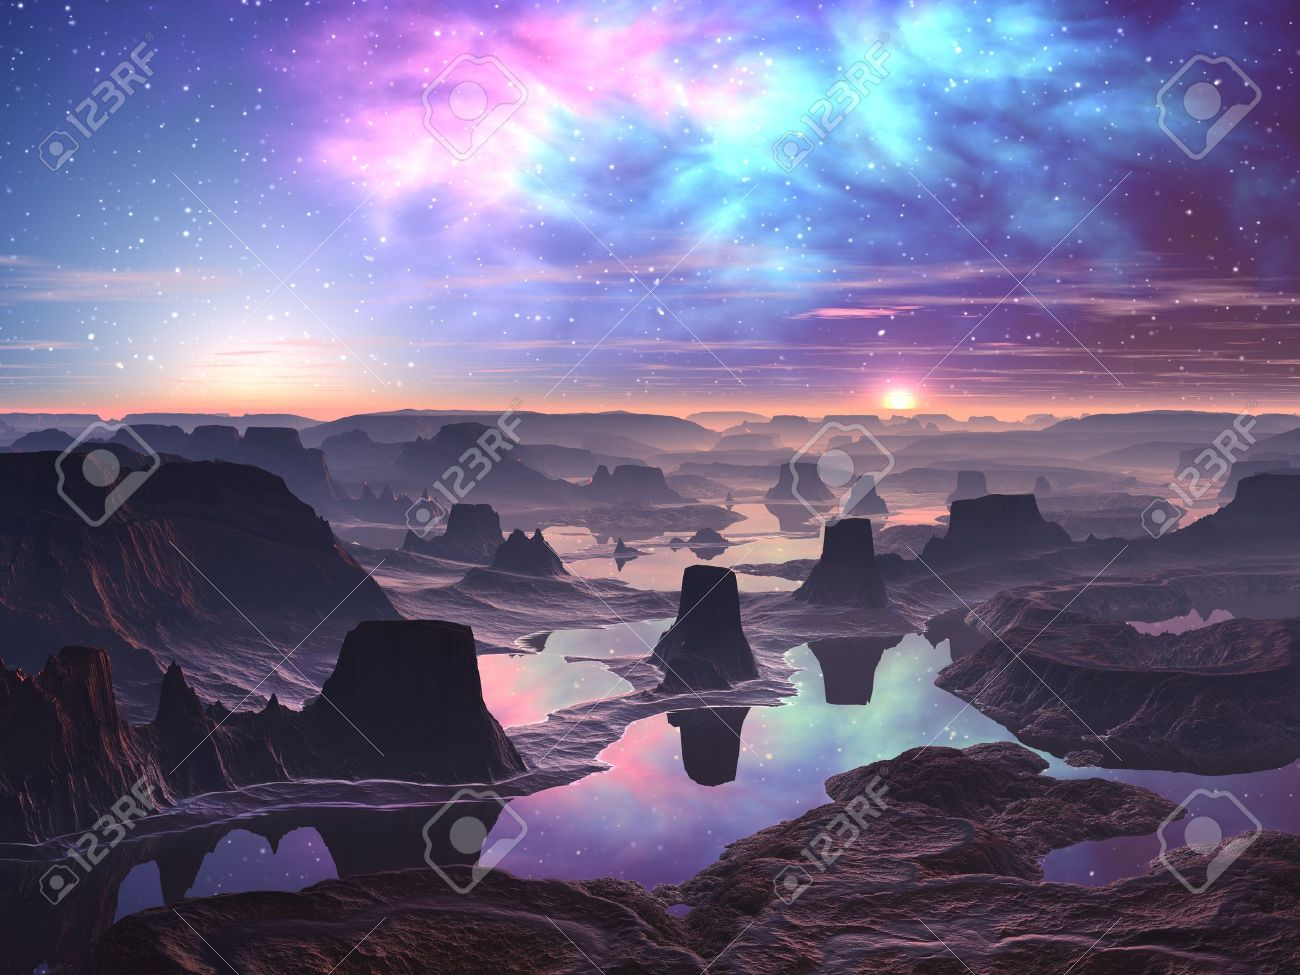 Gaseous Aurora over Mountainous Alien Landscape Stock Photo - 10575989